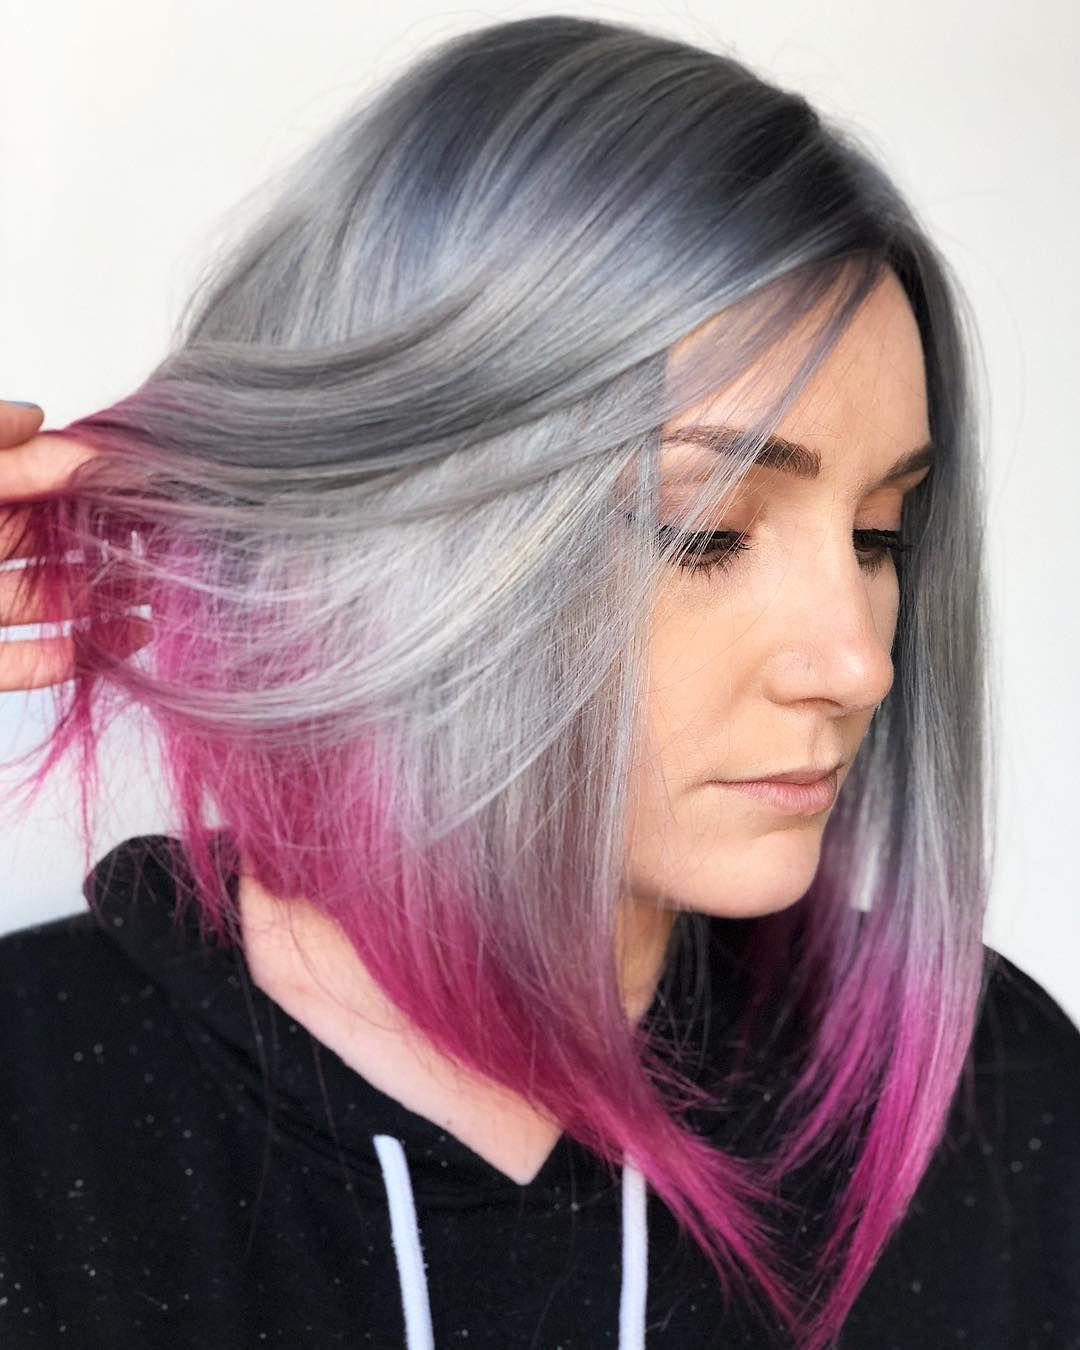 silver hair pink tips | hair in 2019 | hair, hair styles